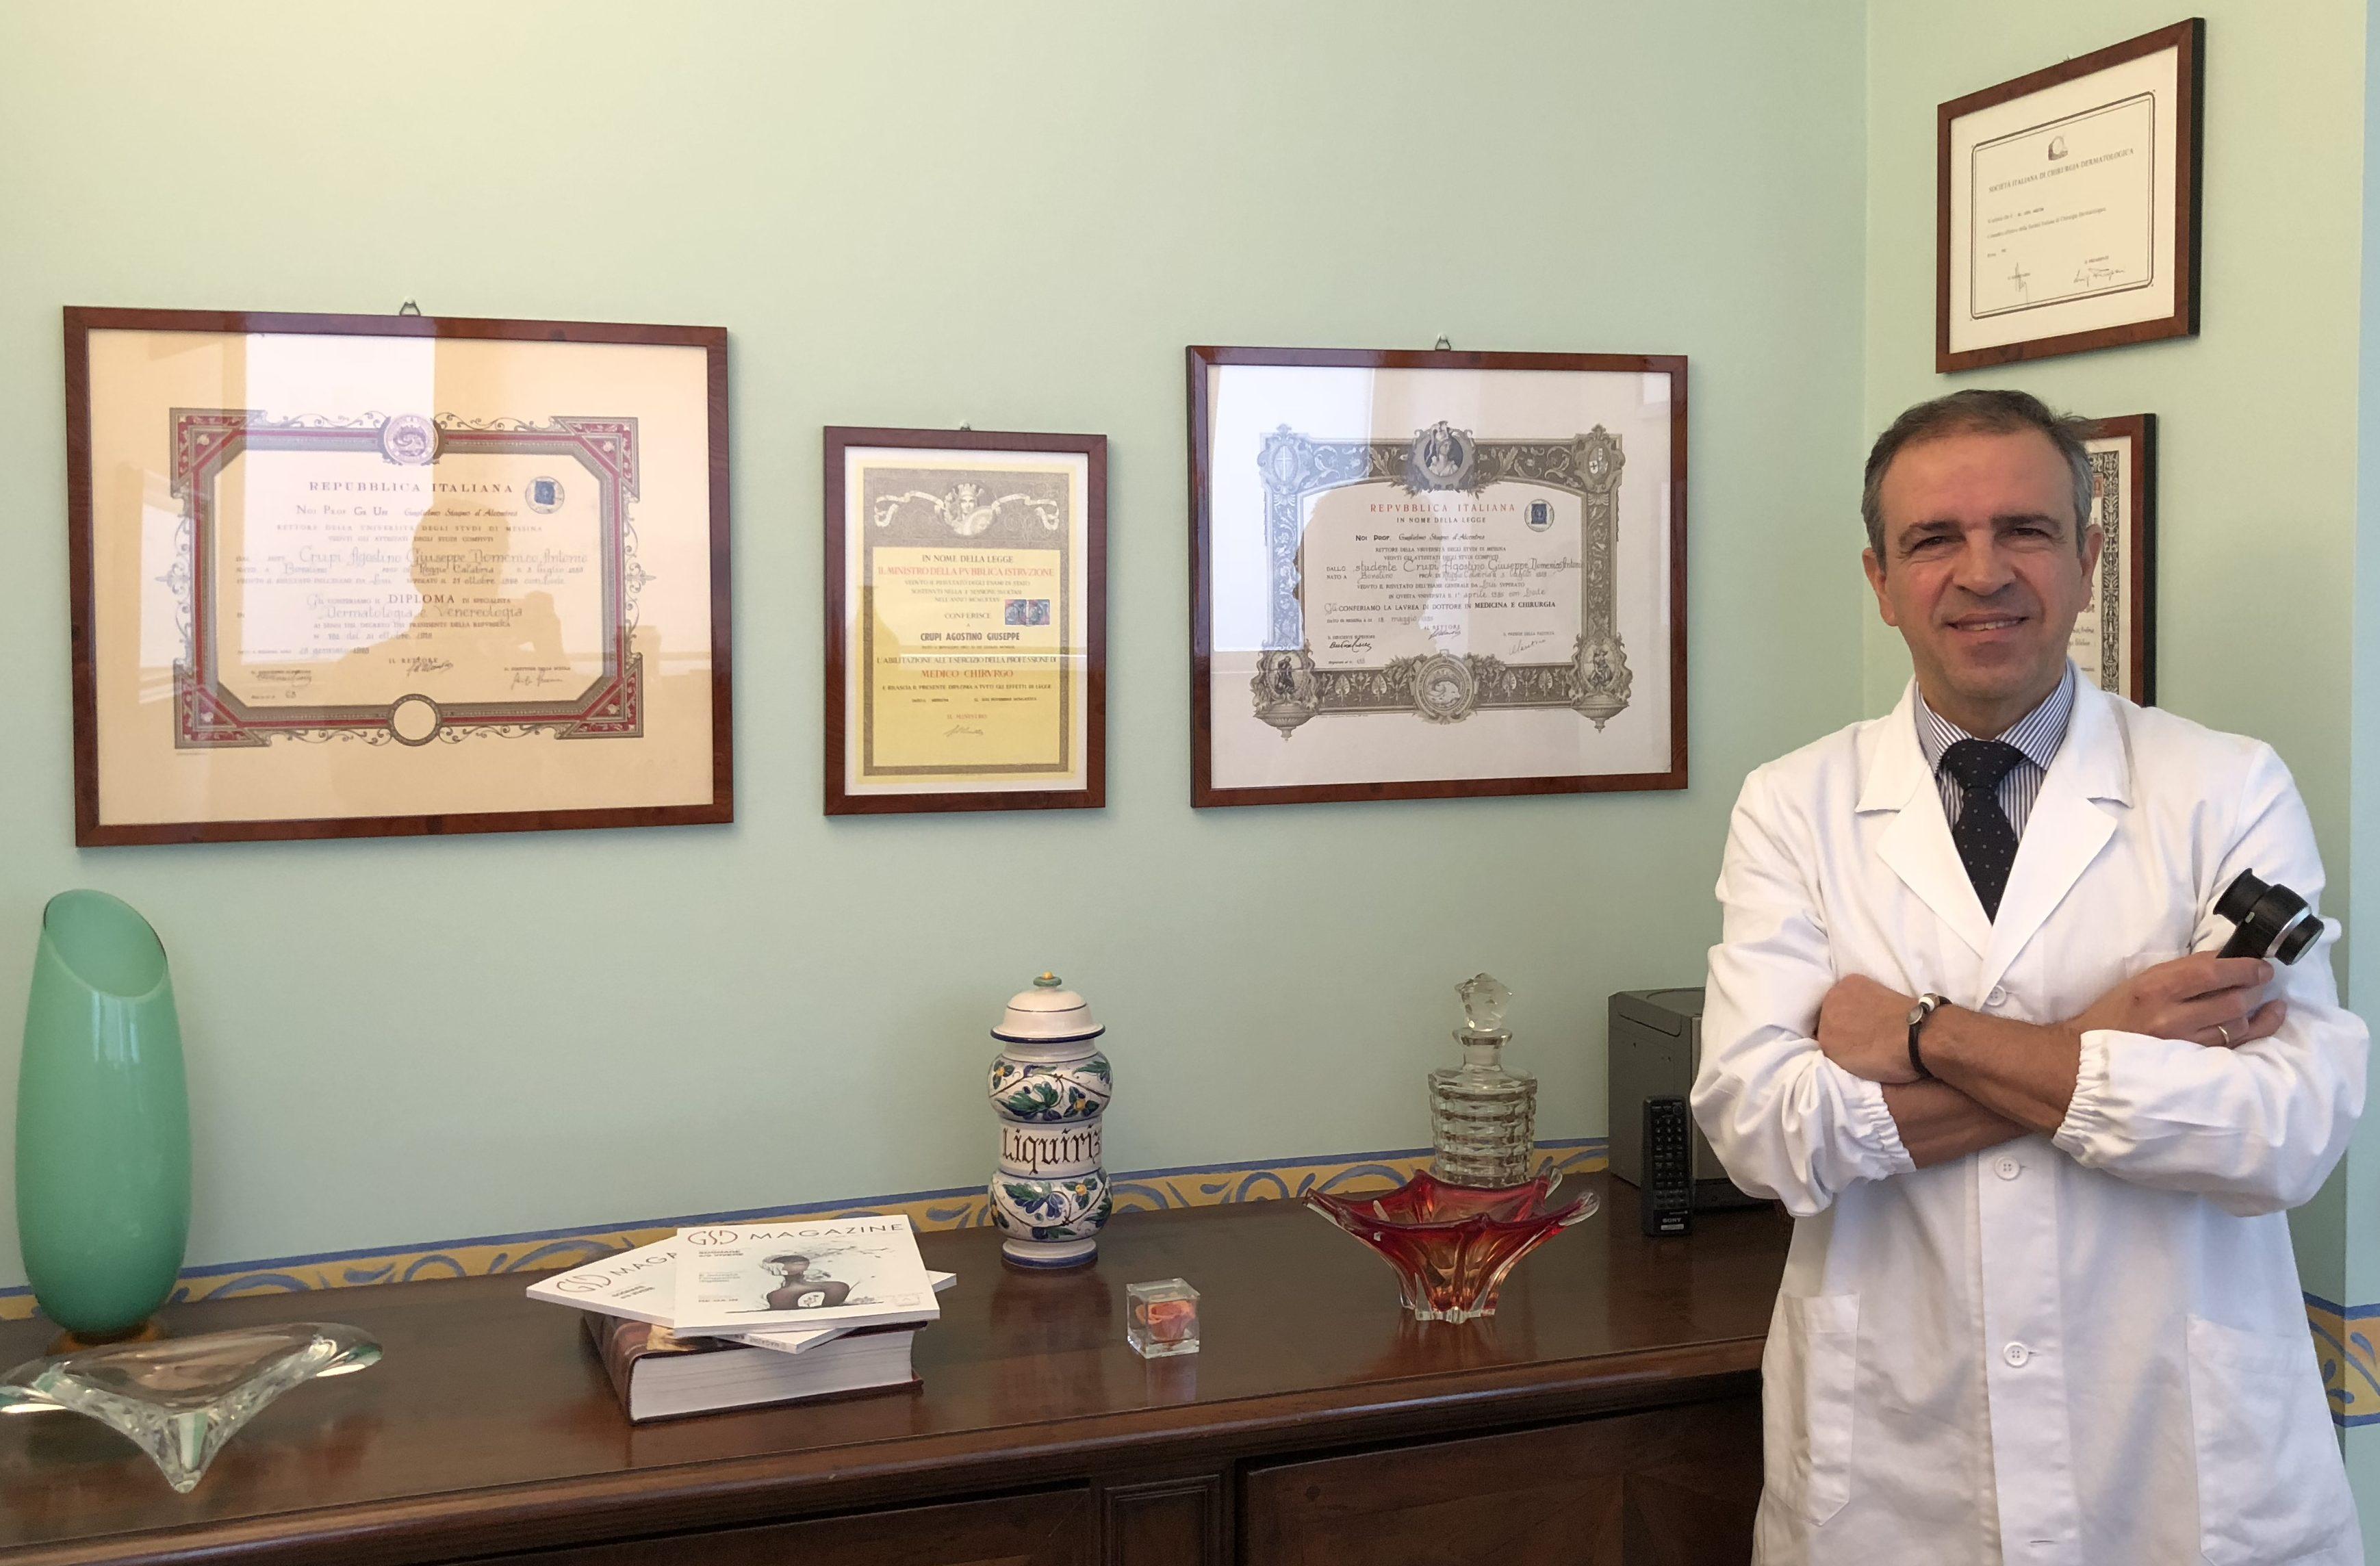 dermatologo novara - Crupi Agostino